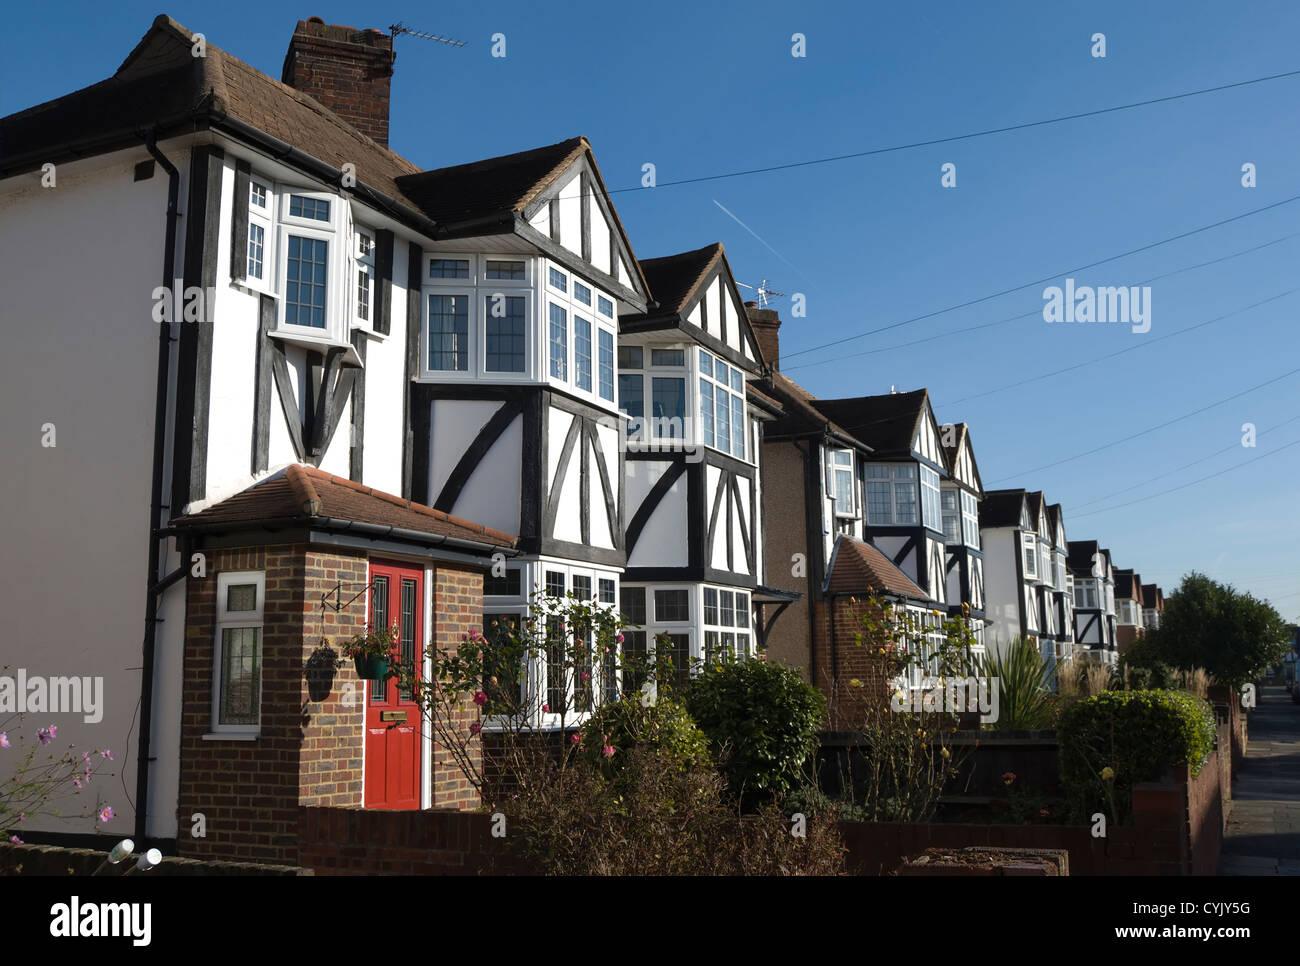 1930s mock tudor houses,  whitton, middlesex, england - Stock Image